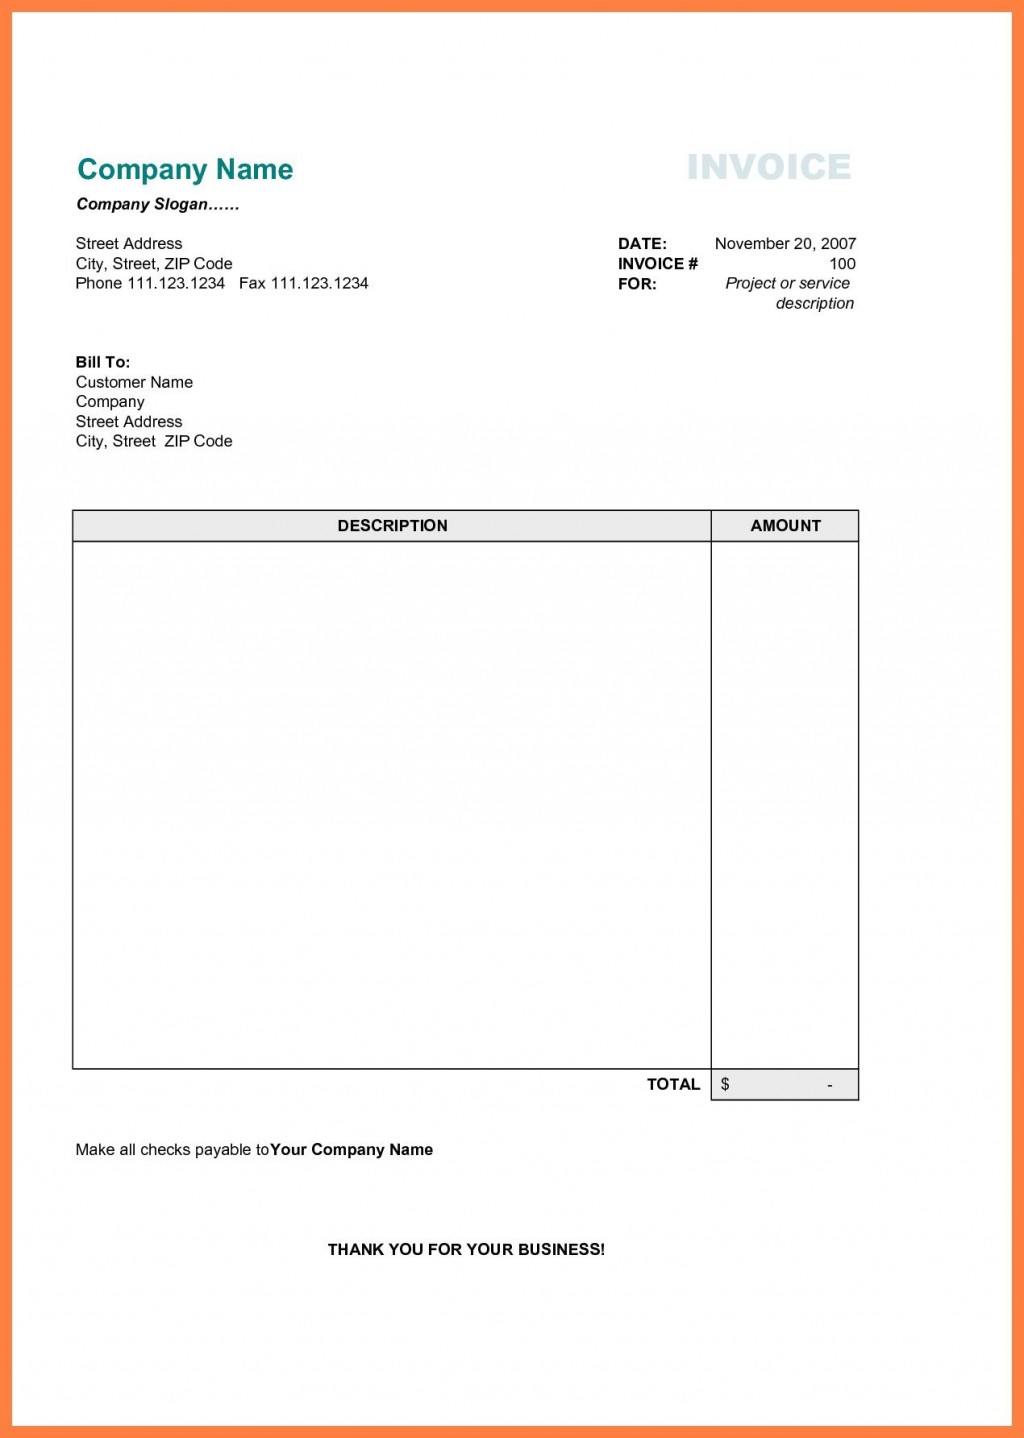 001 Wondrou Simple Invoice Template Word Highest Clarity  Cash Receipt Doc Download MicrosoftLarge